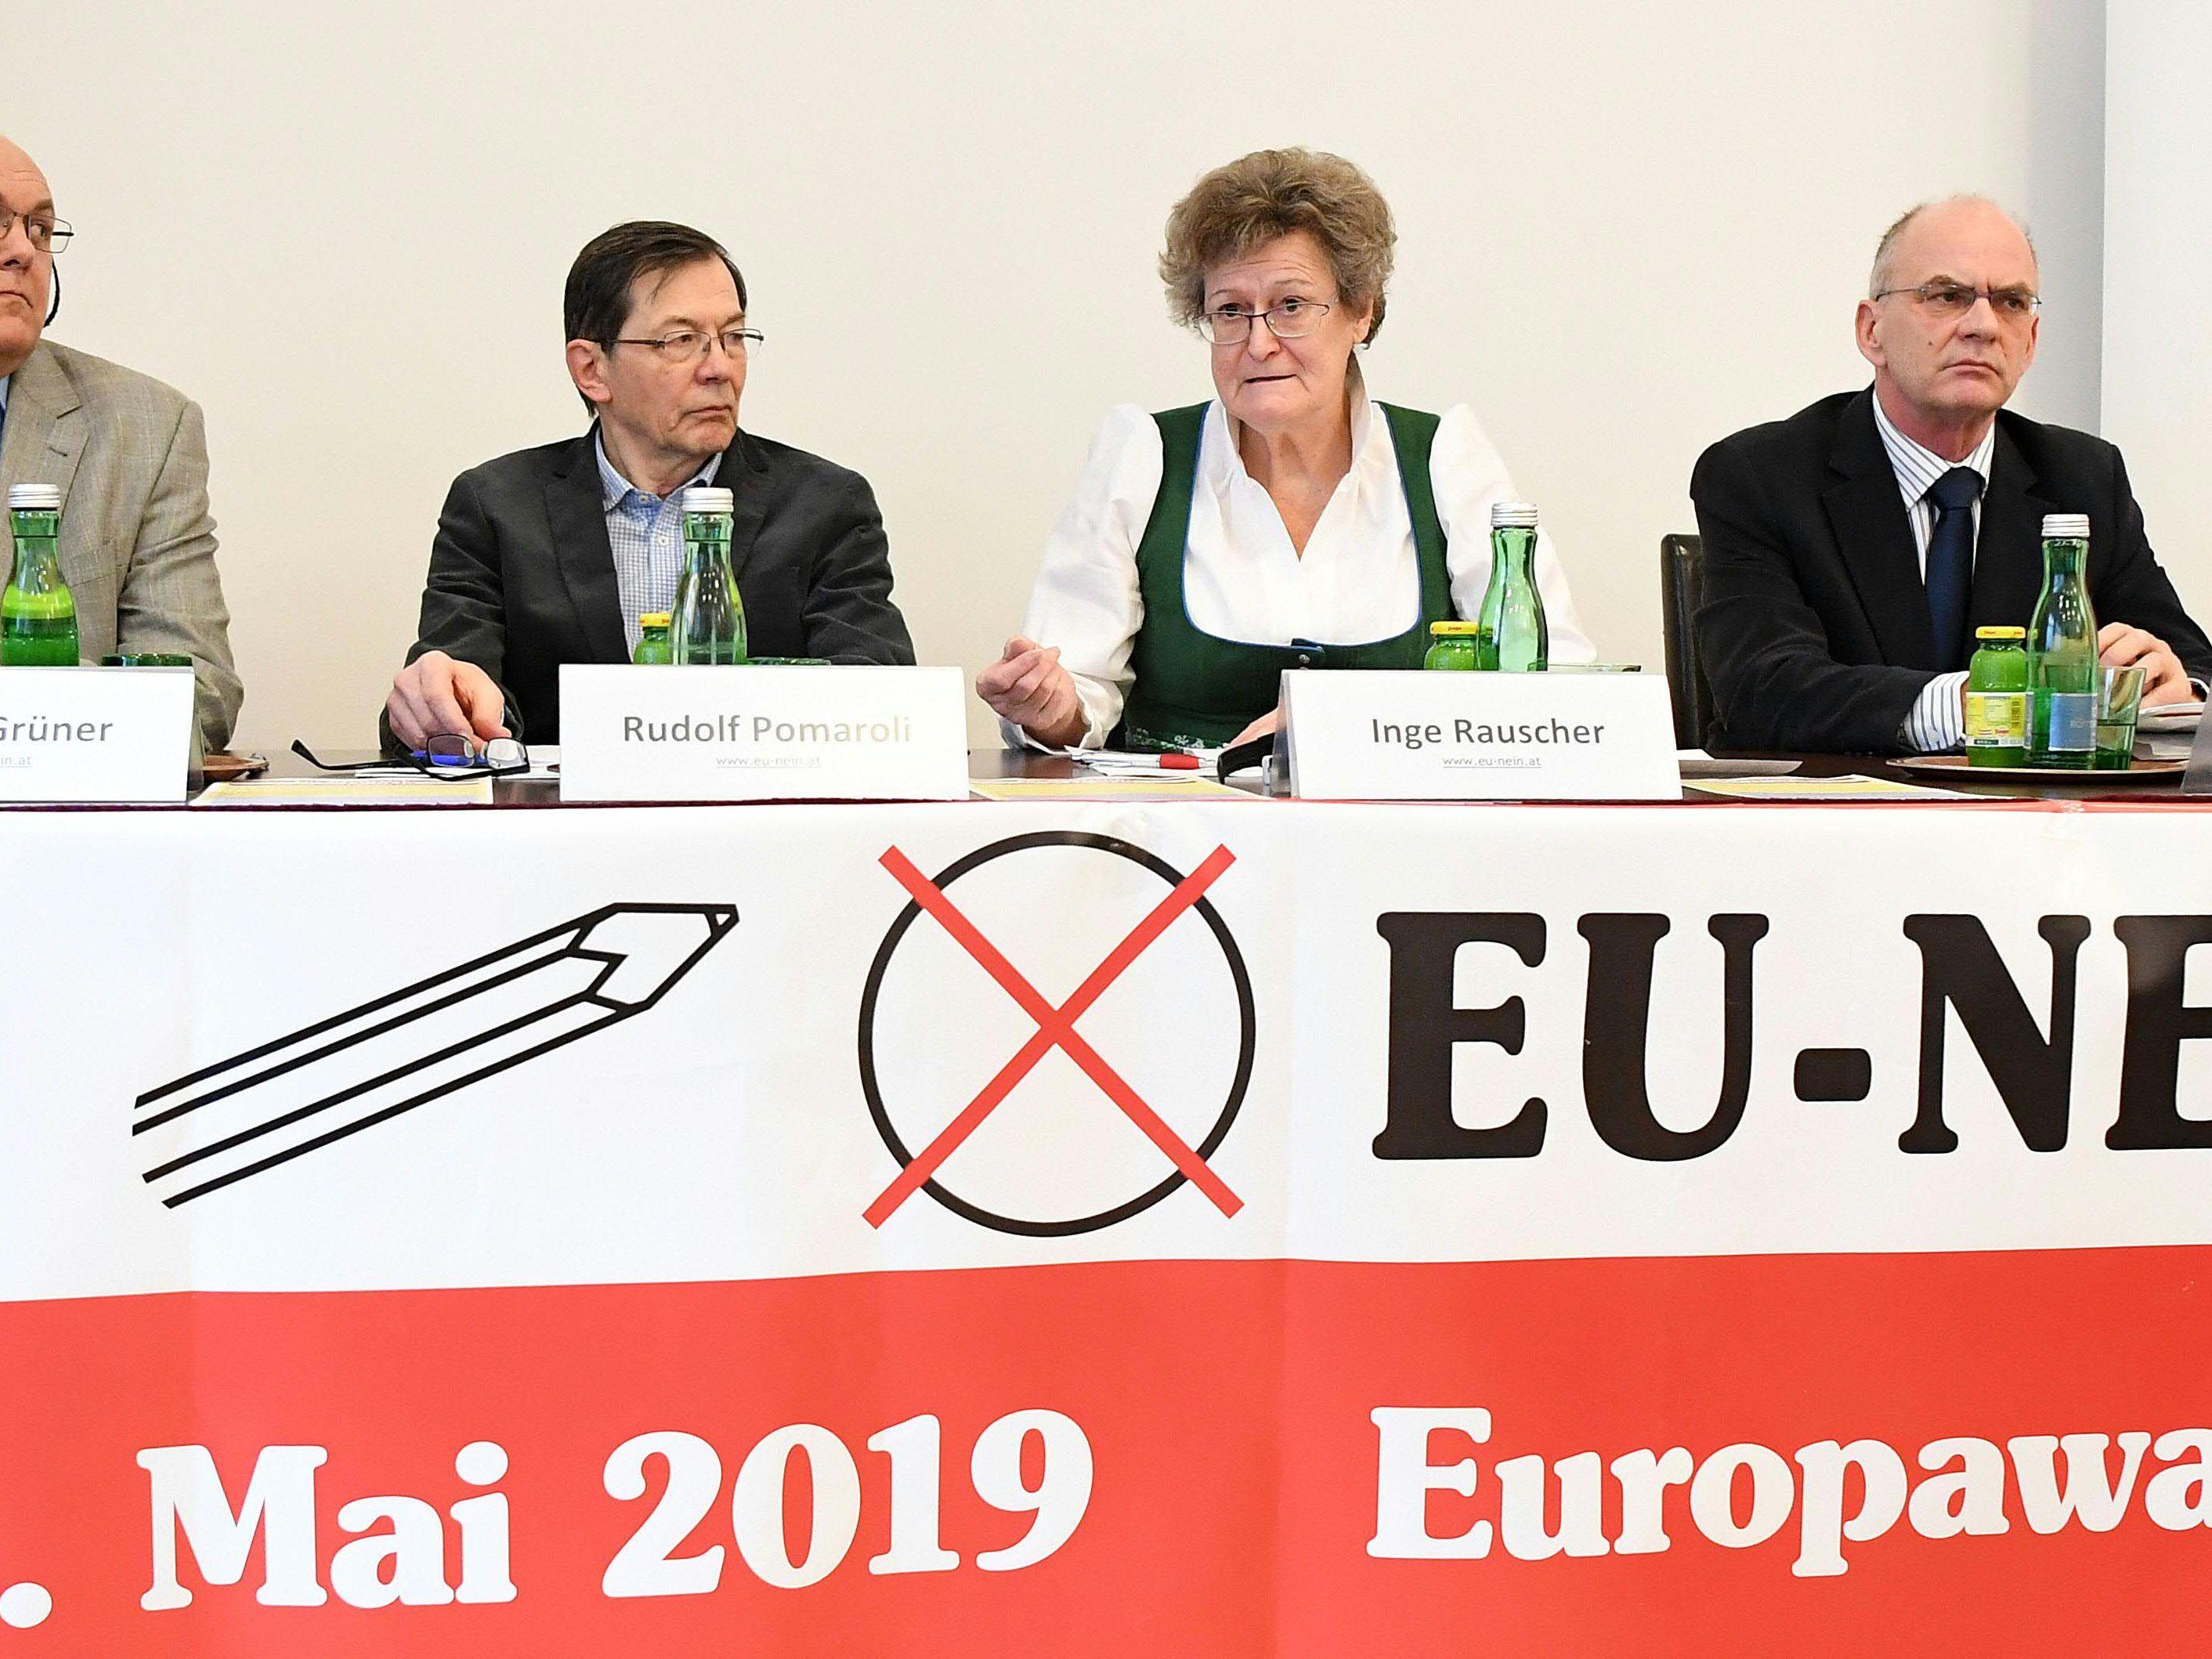 """EU-NEIN"" will ins Europaparlament einziehen."